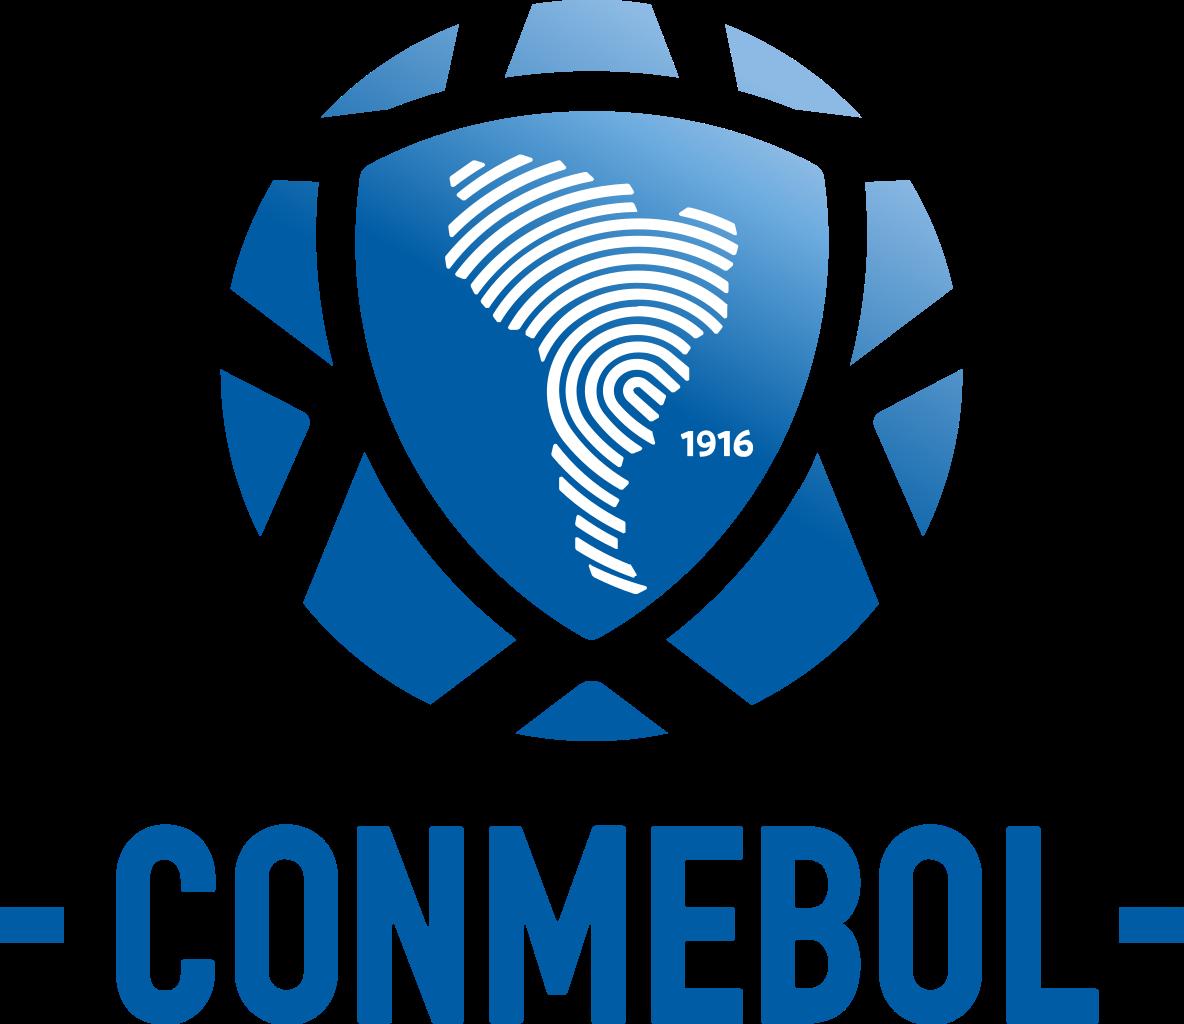 Conmebol logo.png